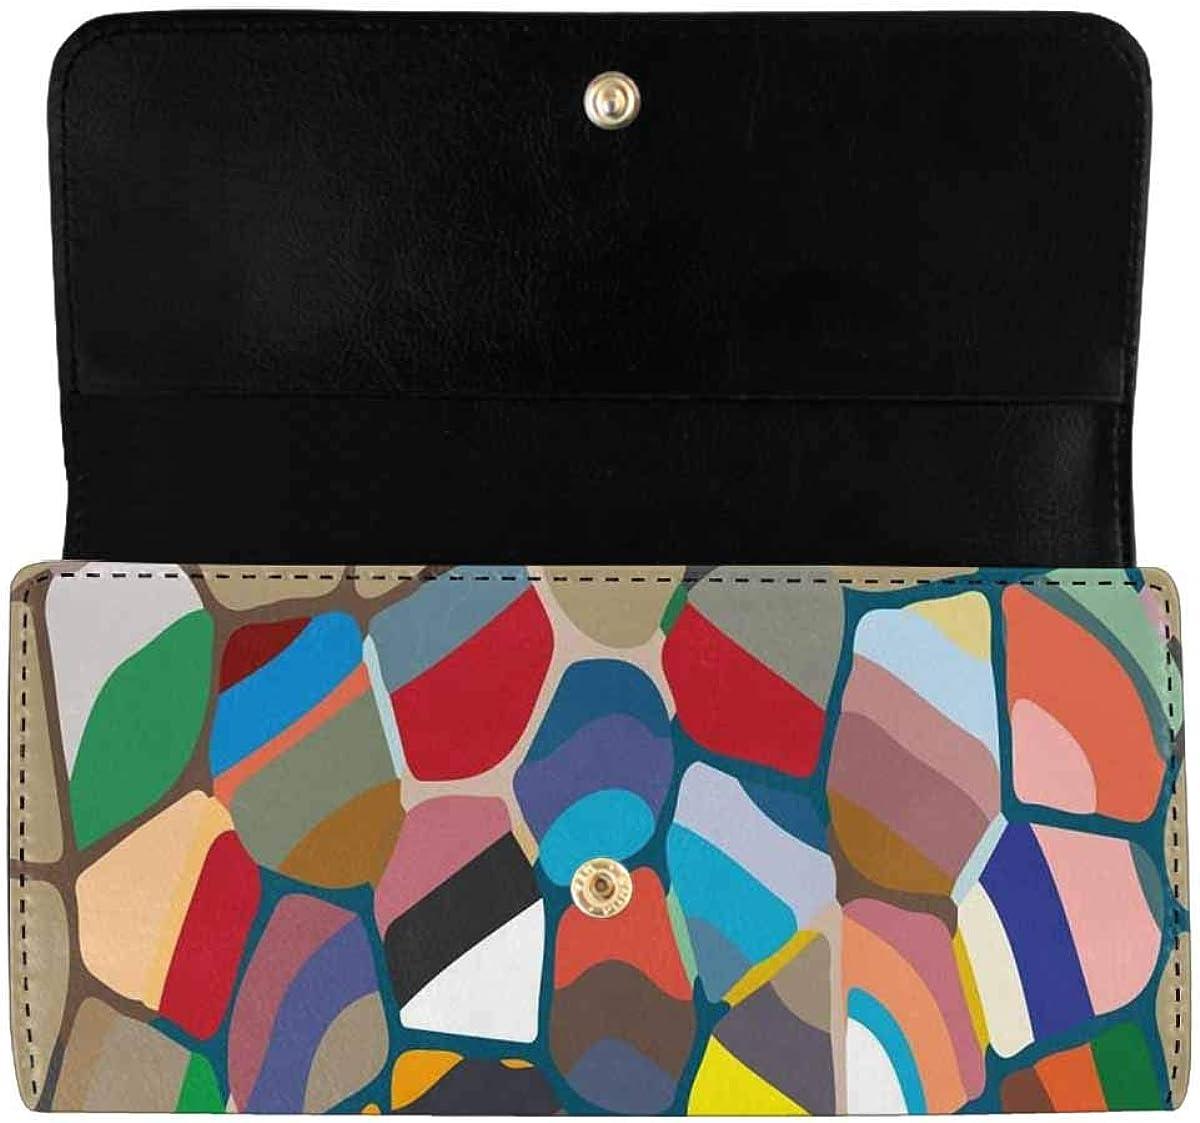 INTERESTPRINT Women's Trifold Clutch Wallets Colorful Cactus Card Holder Purses Handbags